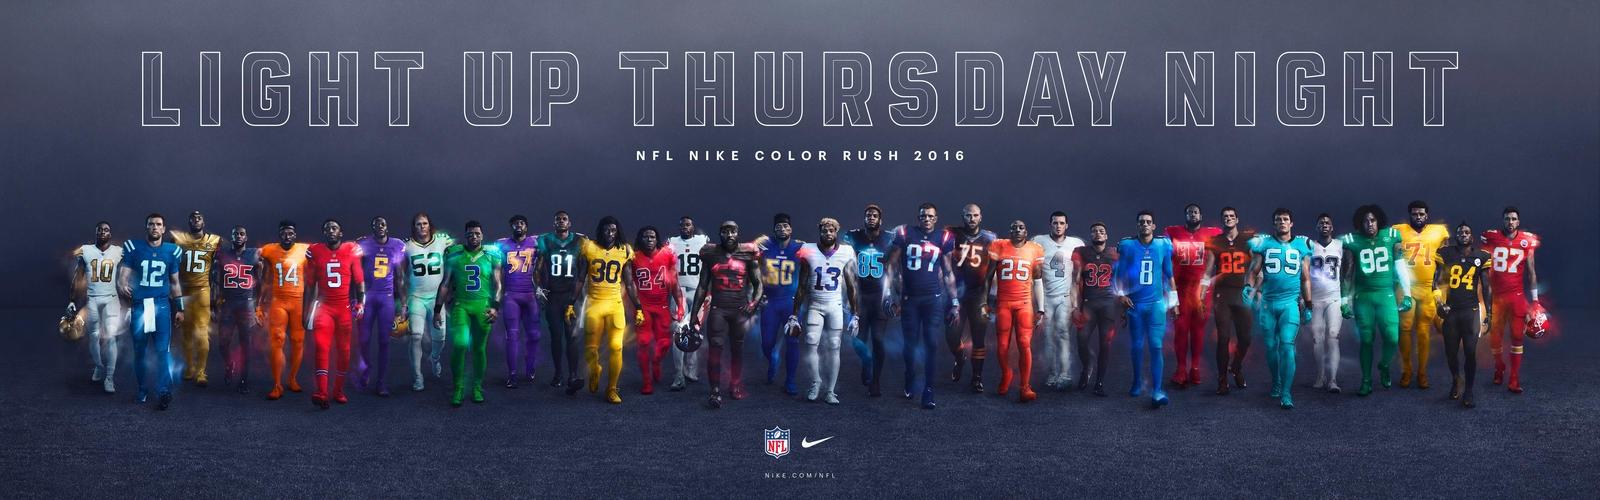 Watch NFL Live Stream (@watchnfllivestreamino) Cover Image